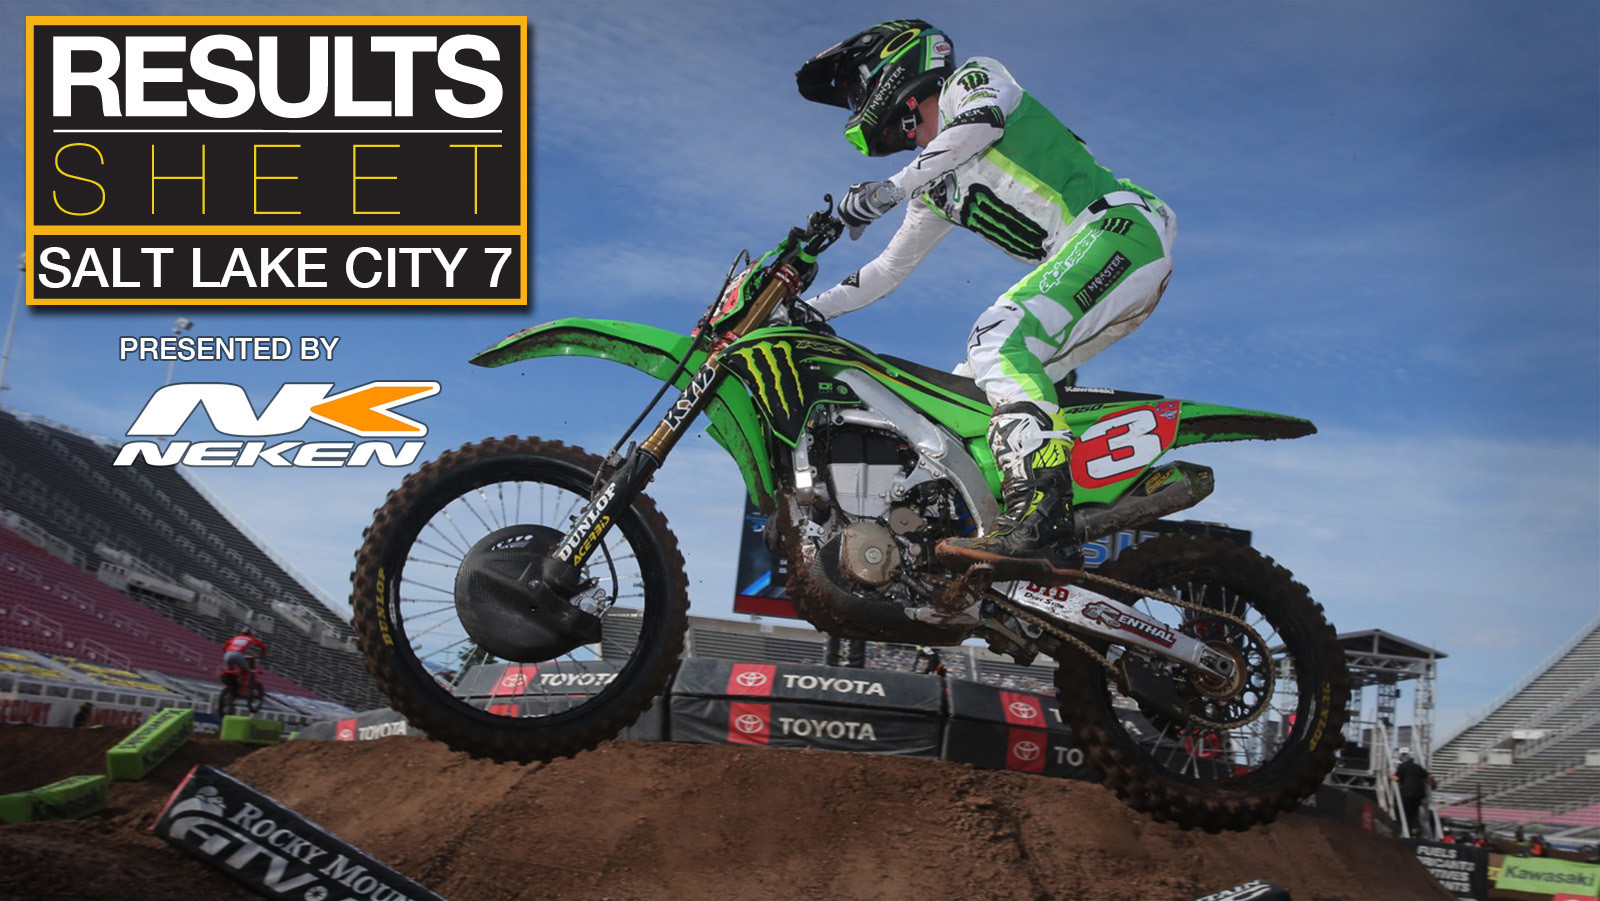 Results Sheet: 2020 Salt Lake City 7 Supercross